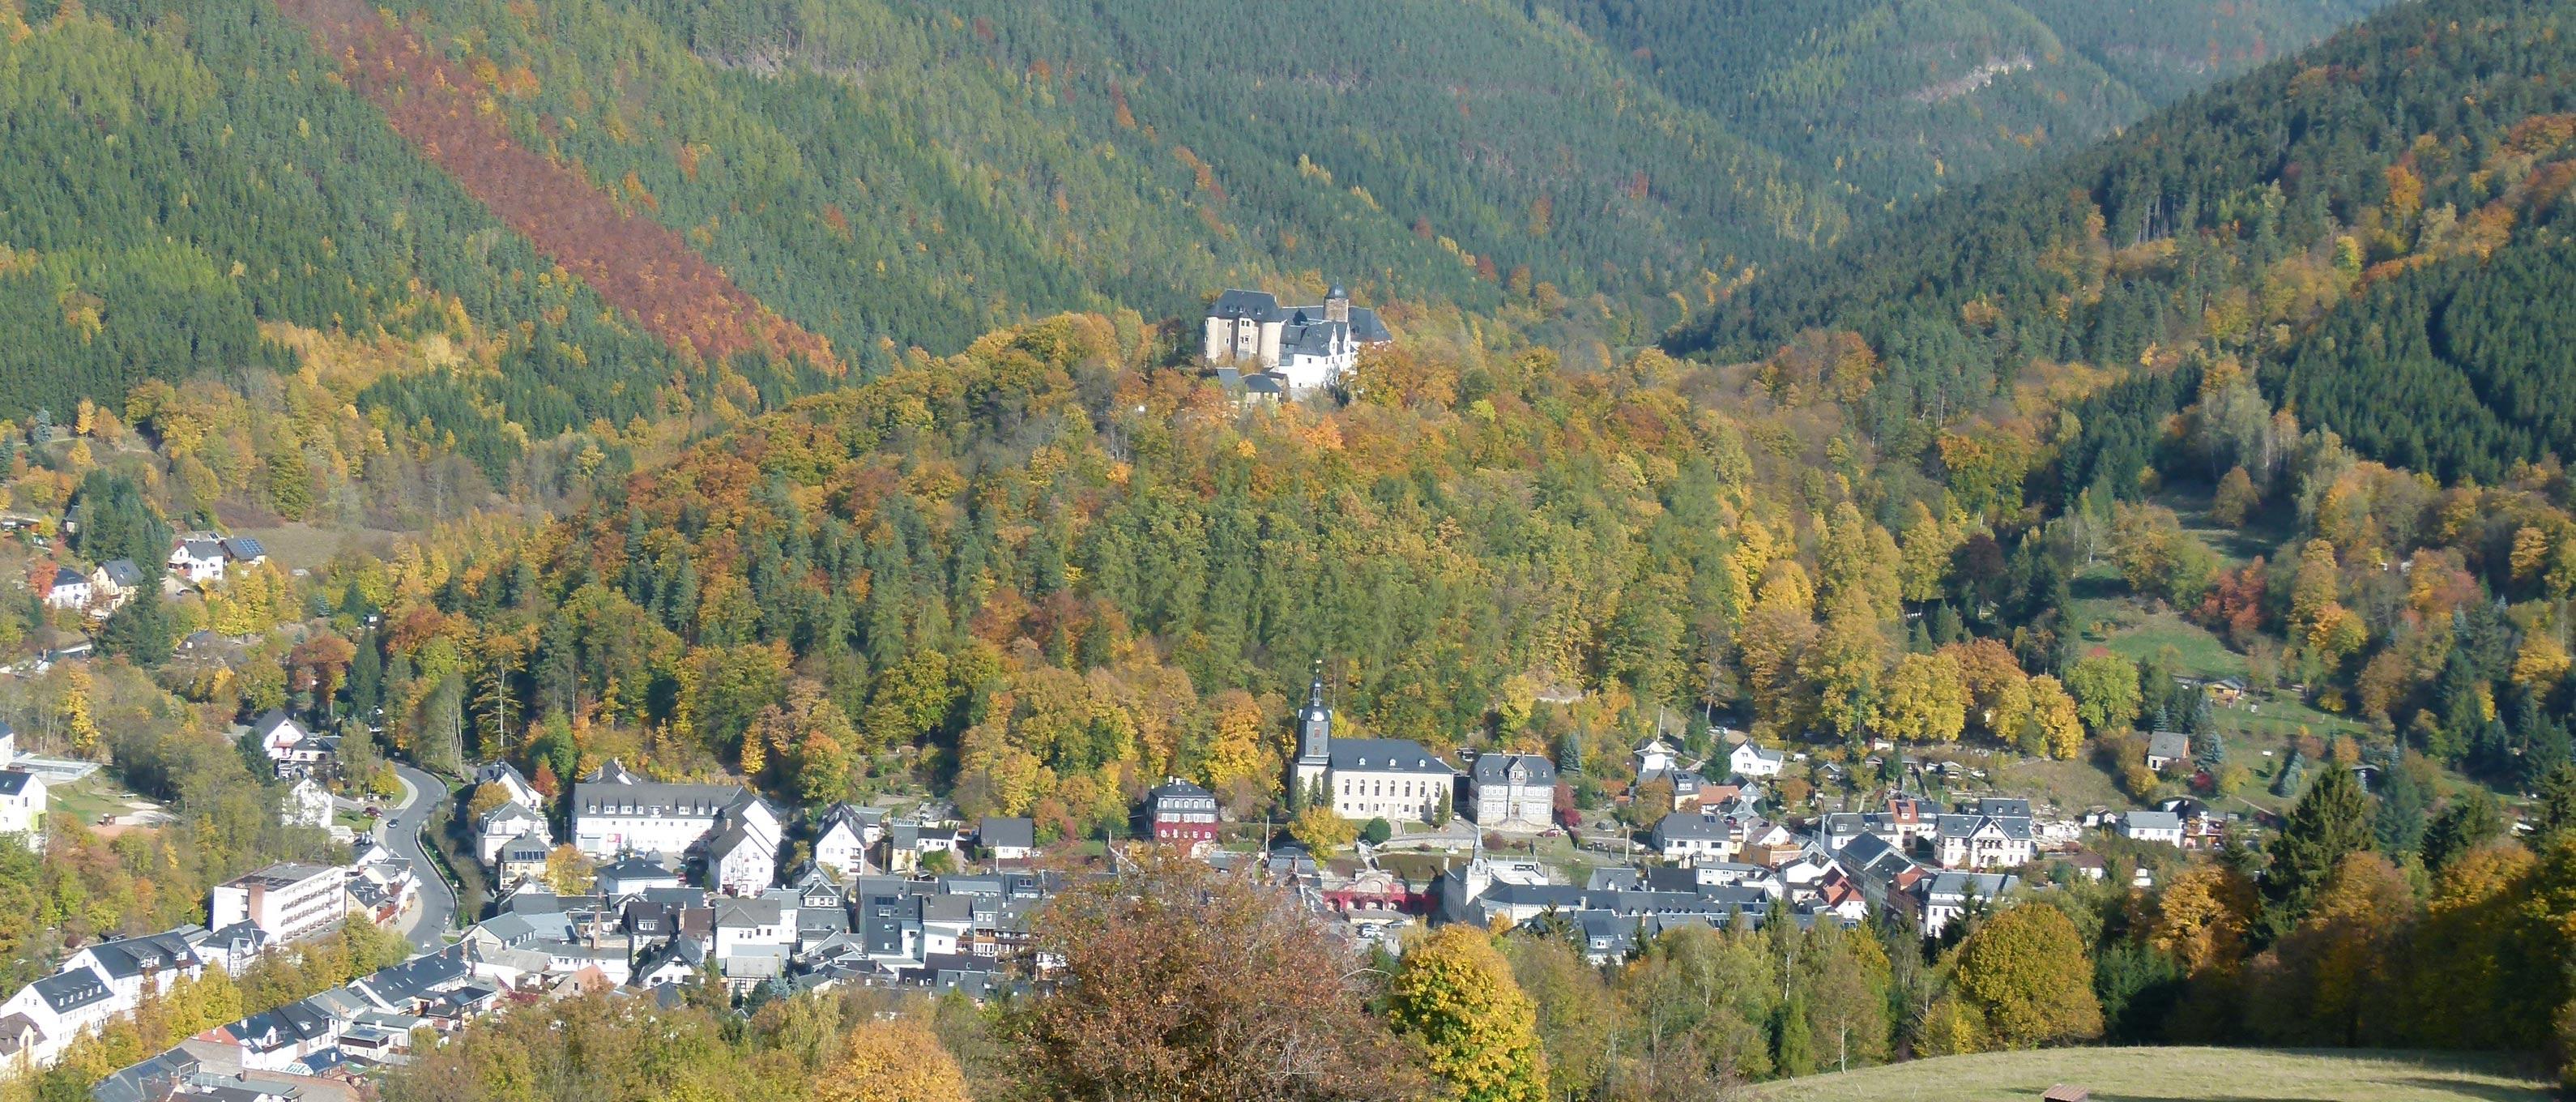 Leutenberg - Stadt Im Thüringer Wald